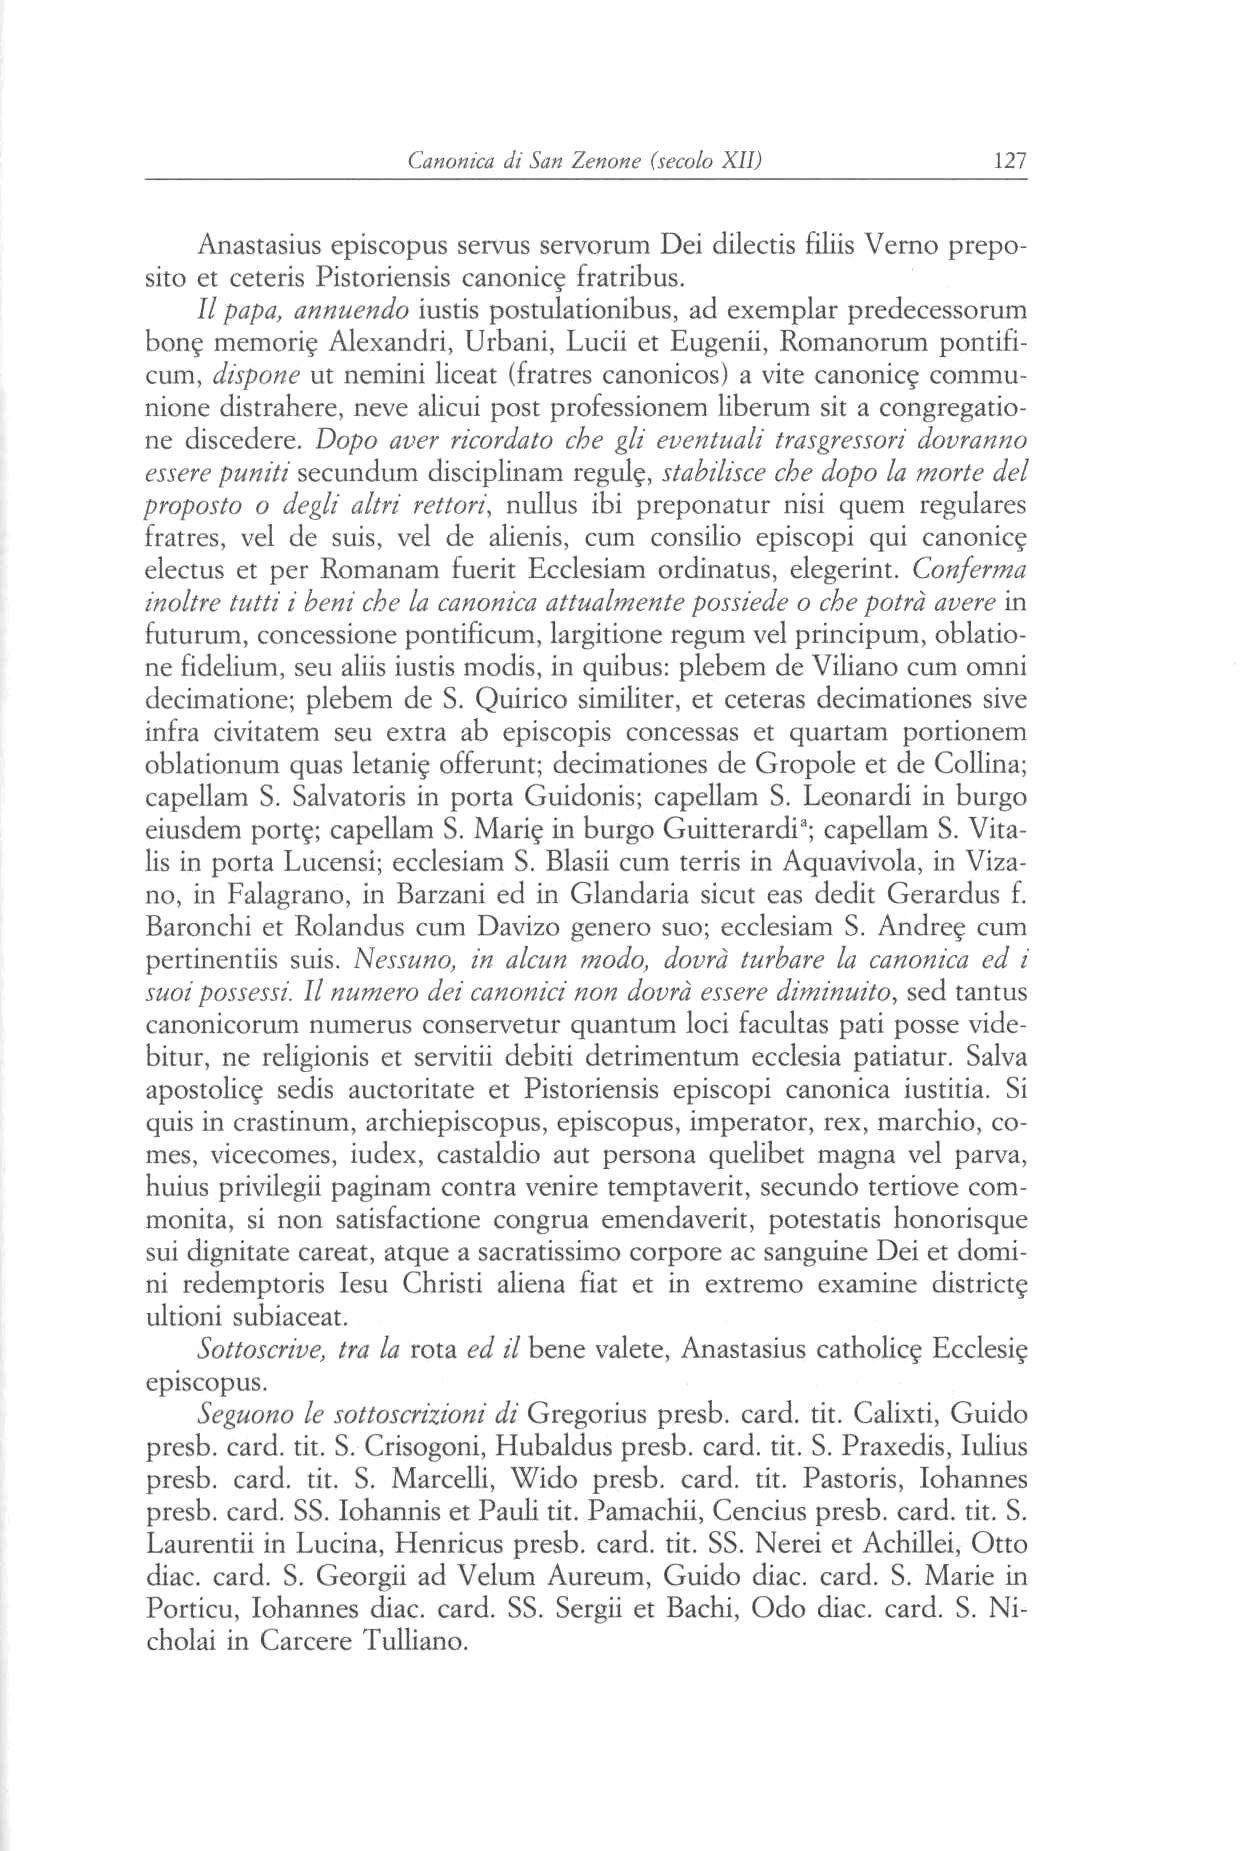 Canonica S. Zenone XII 0127.jpg